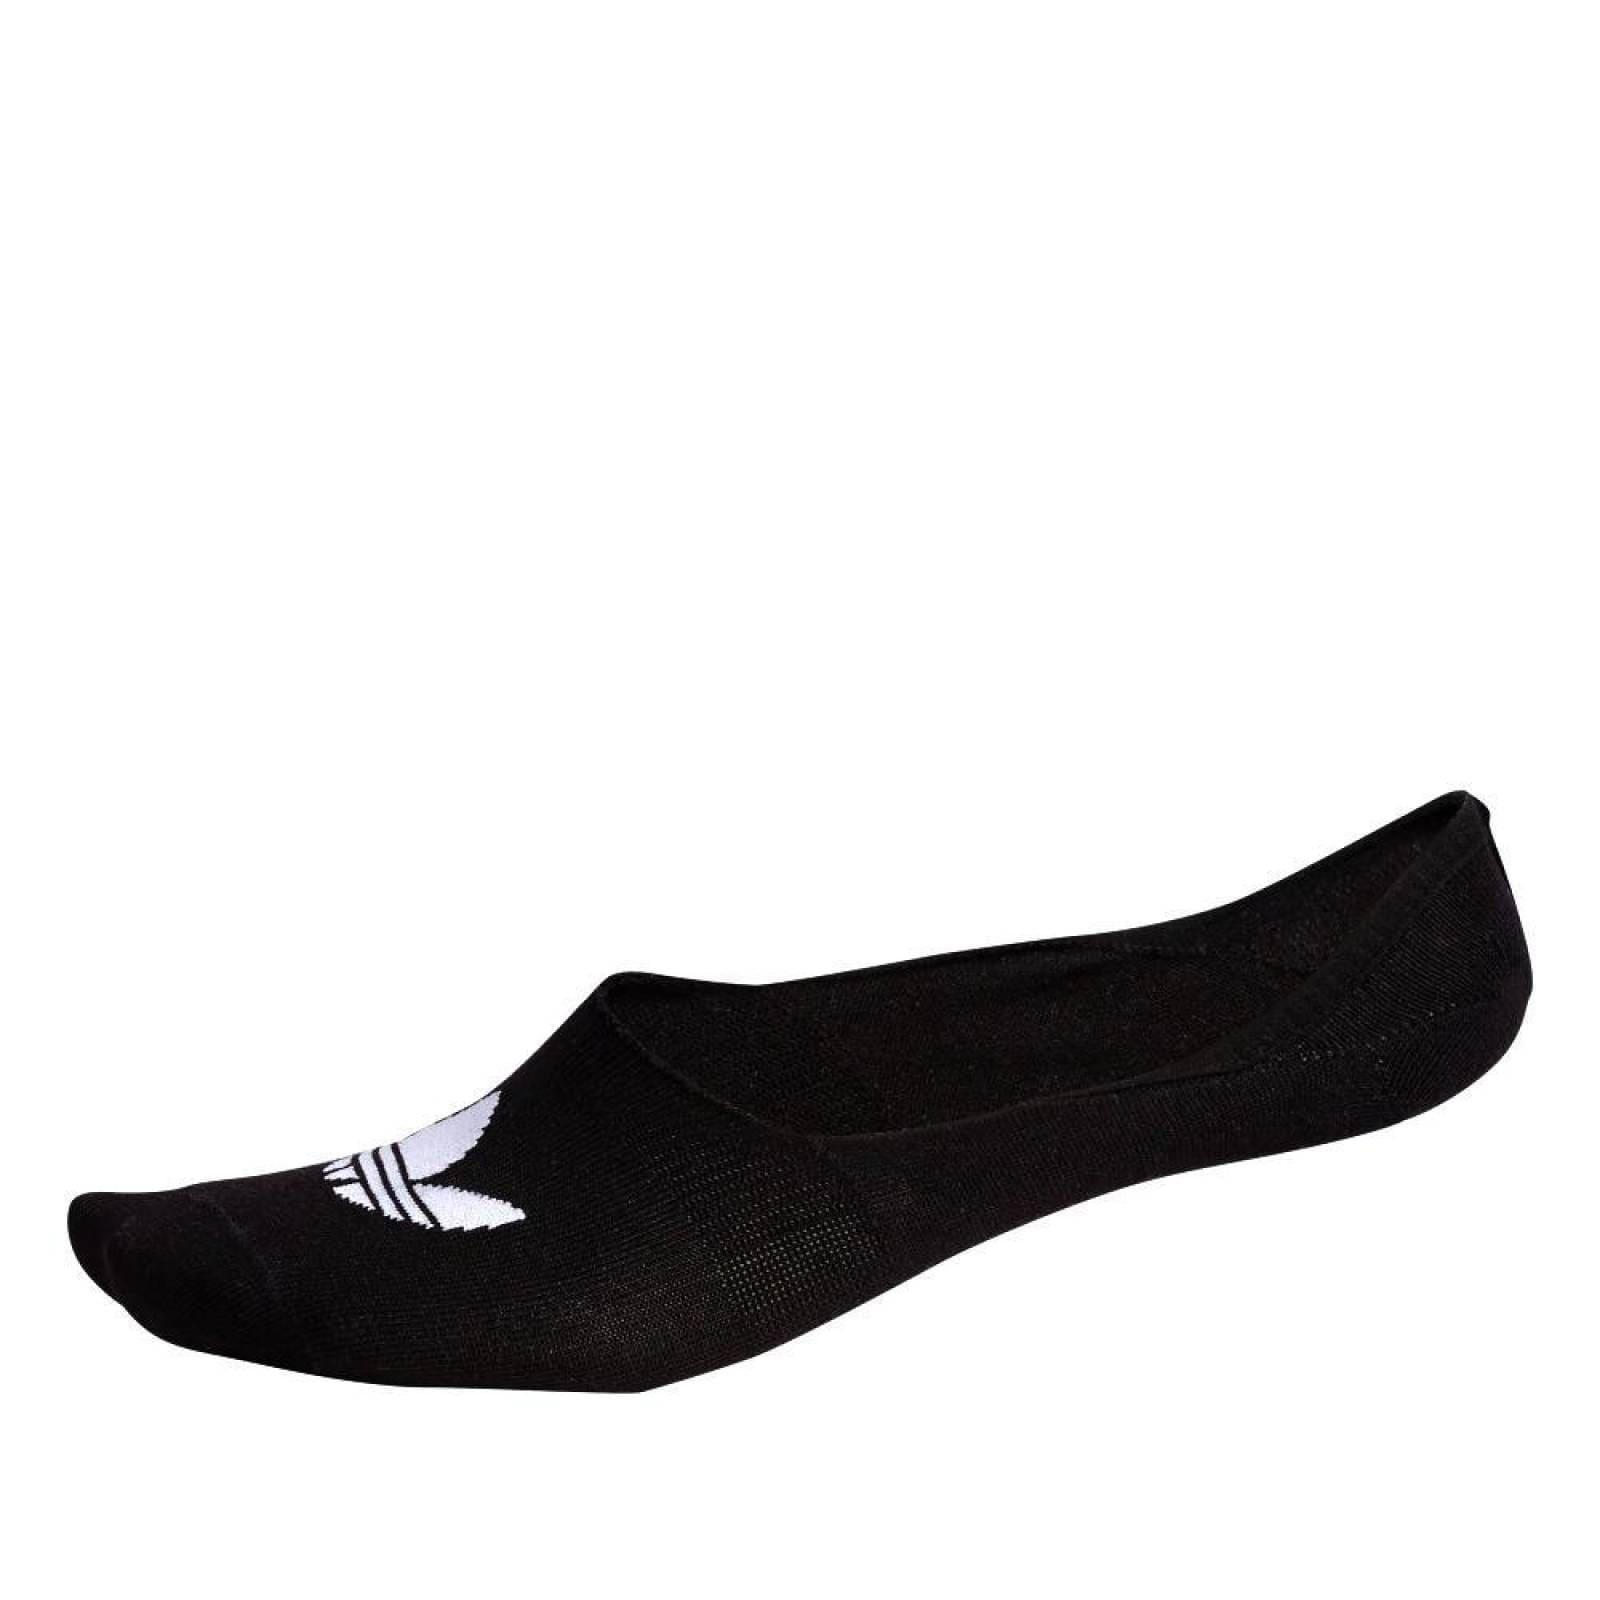 Calcetines Invisibles Adidas Low Cut BK5847 Negro Unisex